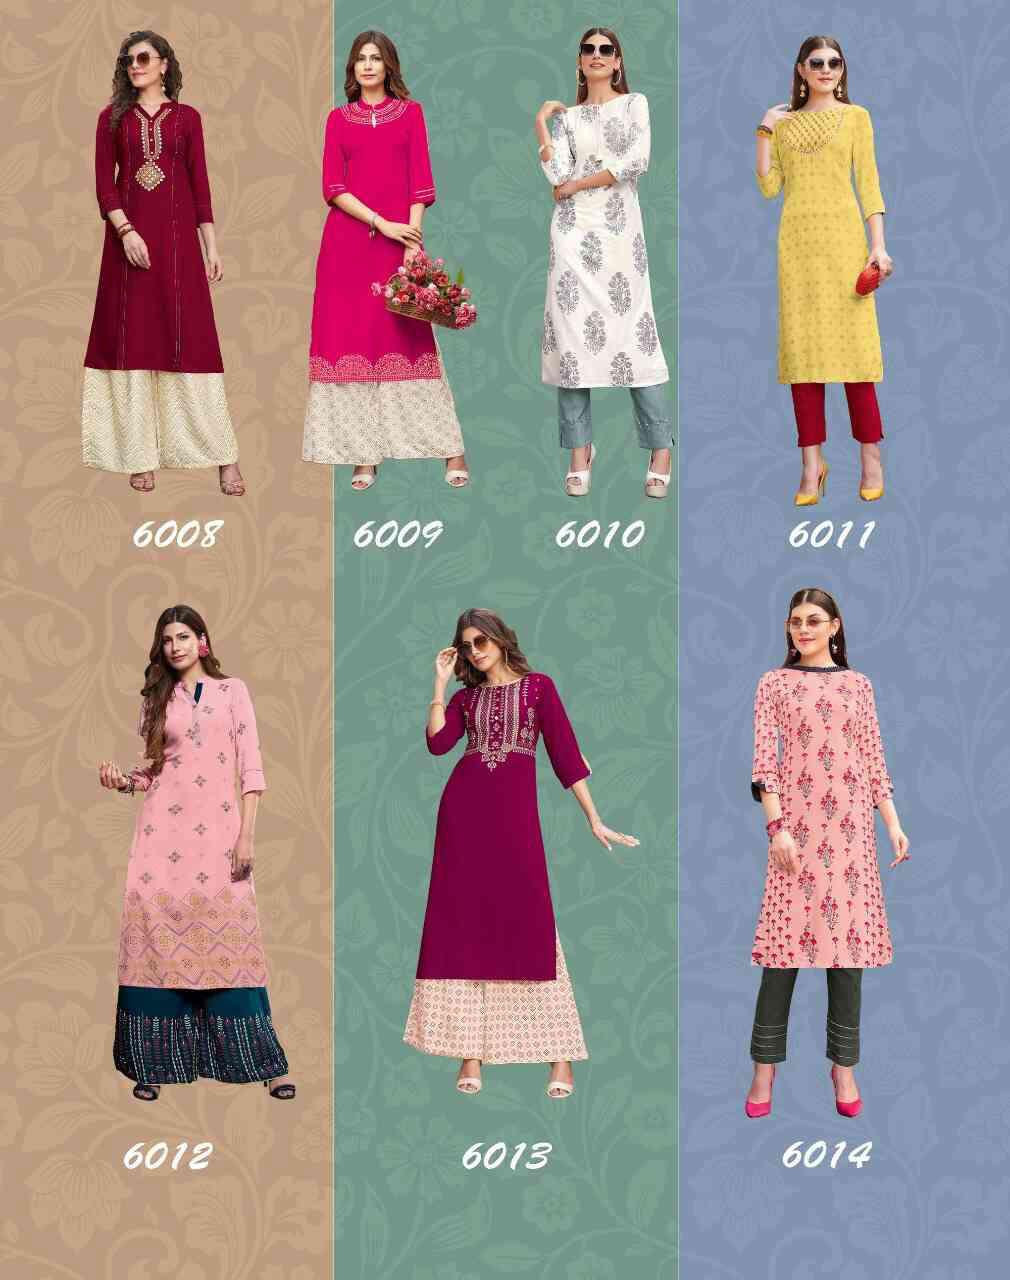 Diya Trends Biba's Vol 6 by Kajal Style Kurti with Palazzo or Pant Wholesale Catalog 14 Pcs 19 - Diya Trends Biba's Vol 6 by Kajal Style Kurti with Palazzo or Pant Wholesale Catalog 14 Pcs